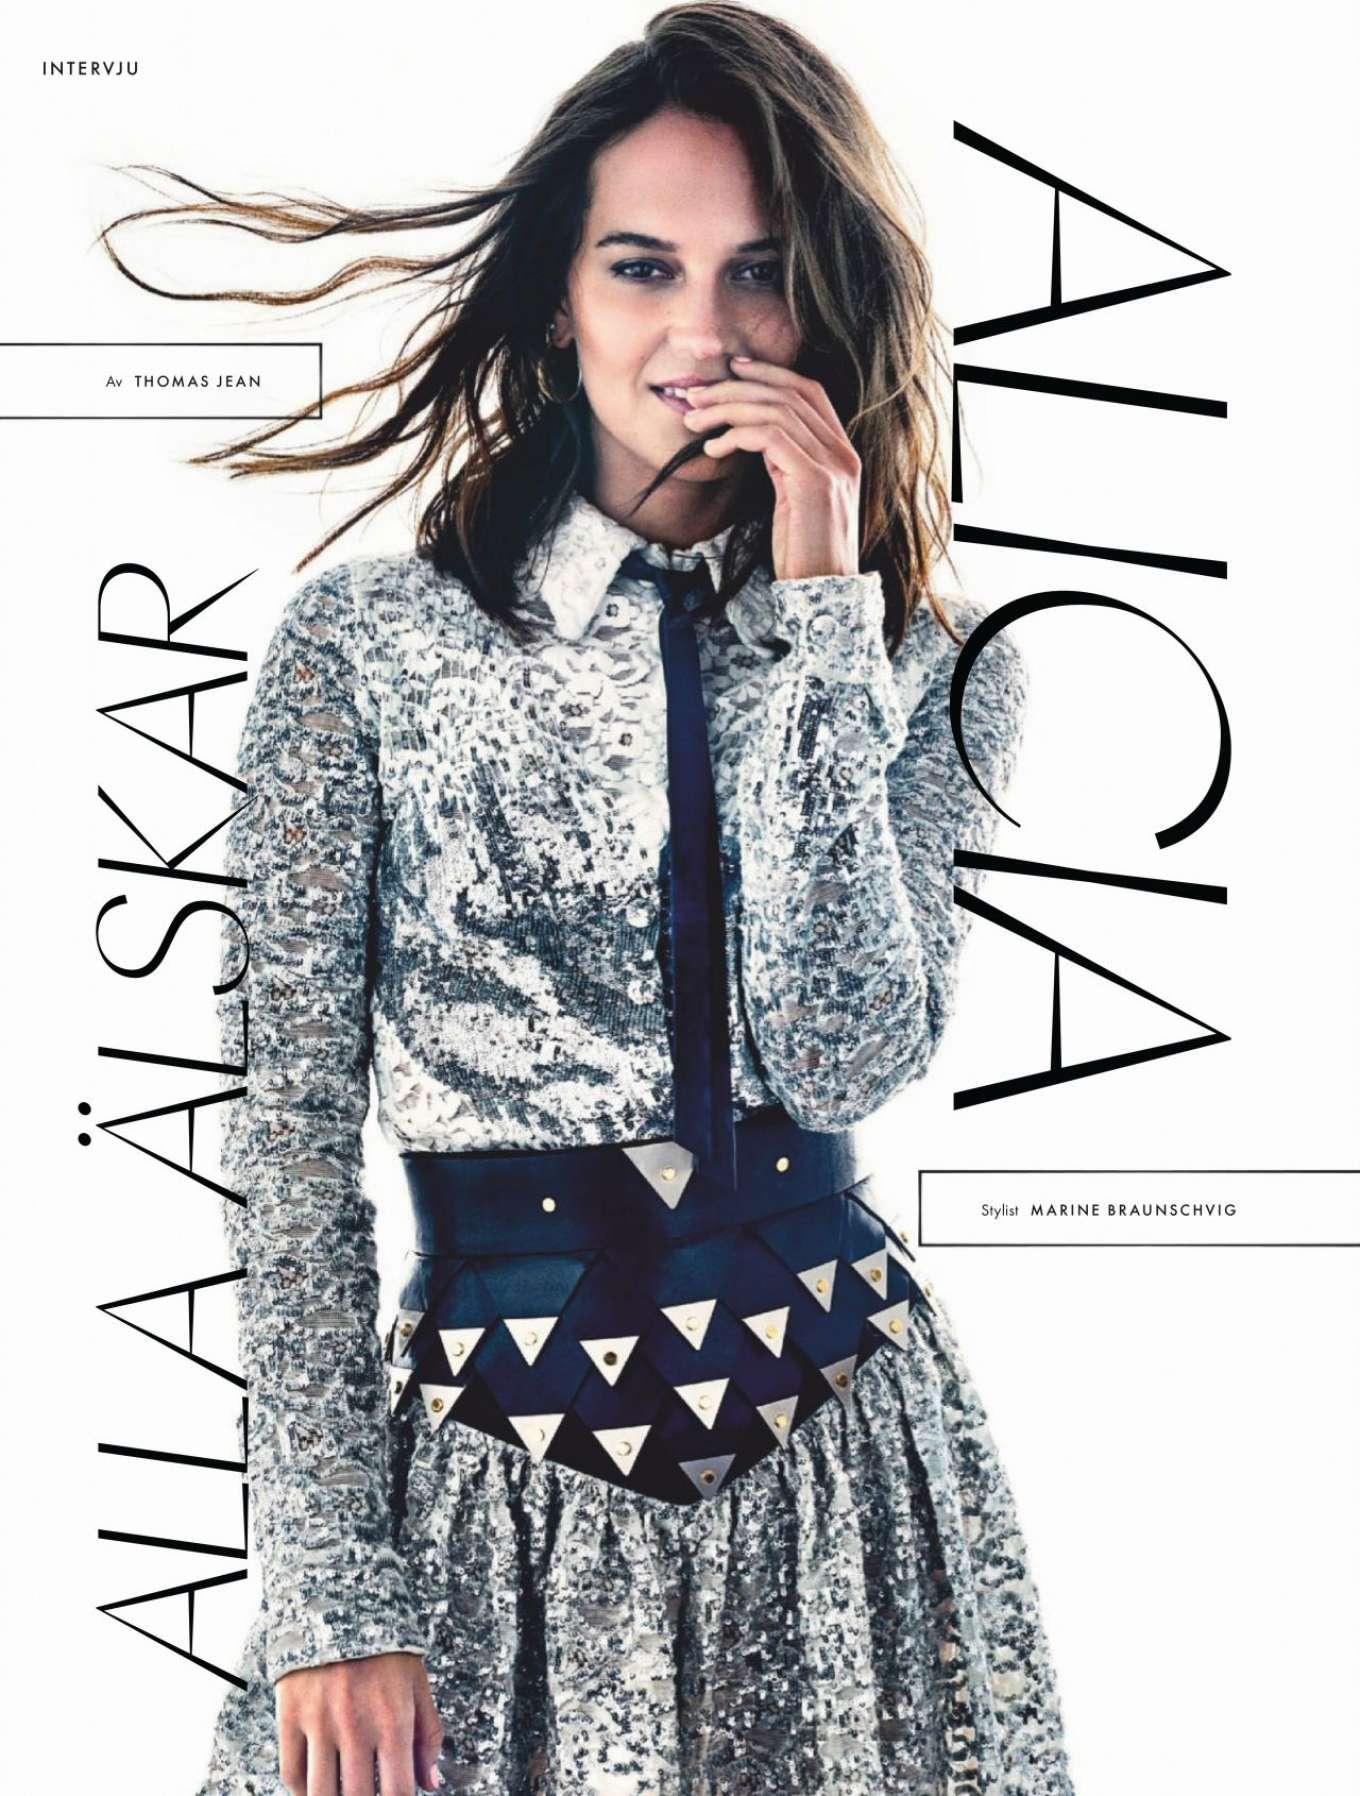 Alicia Vikander - ELLE Sweden Magazine (December 2019)